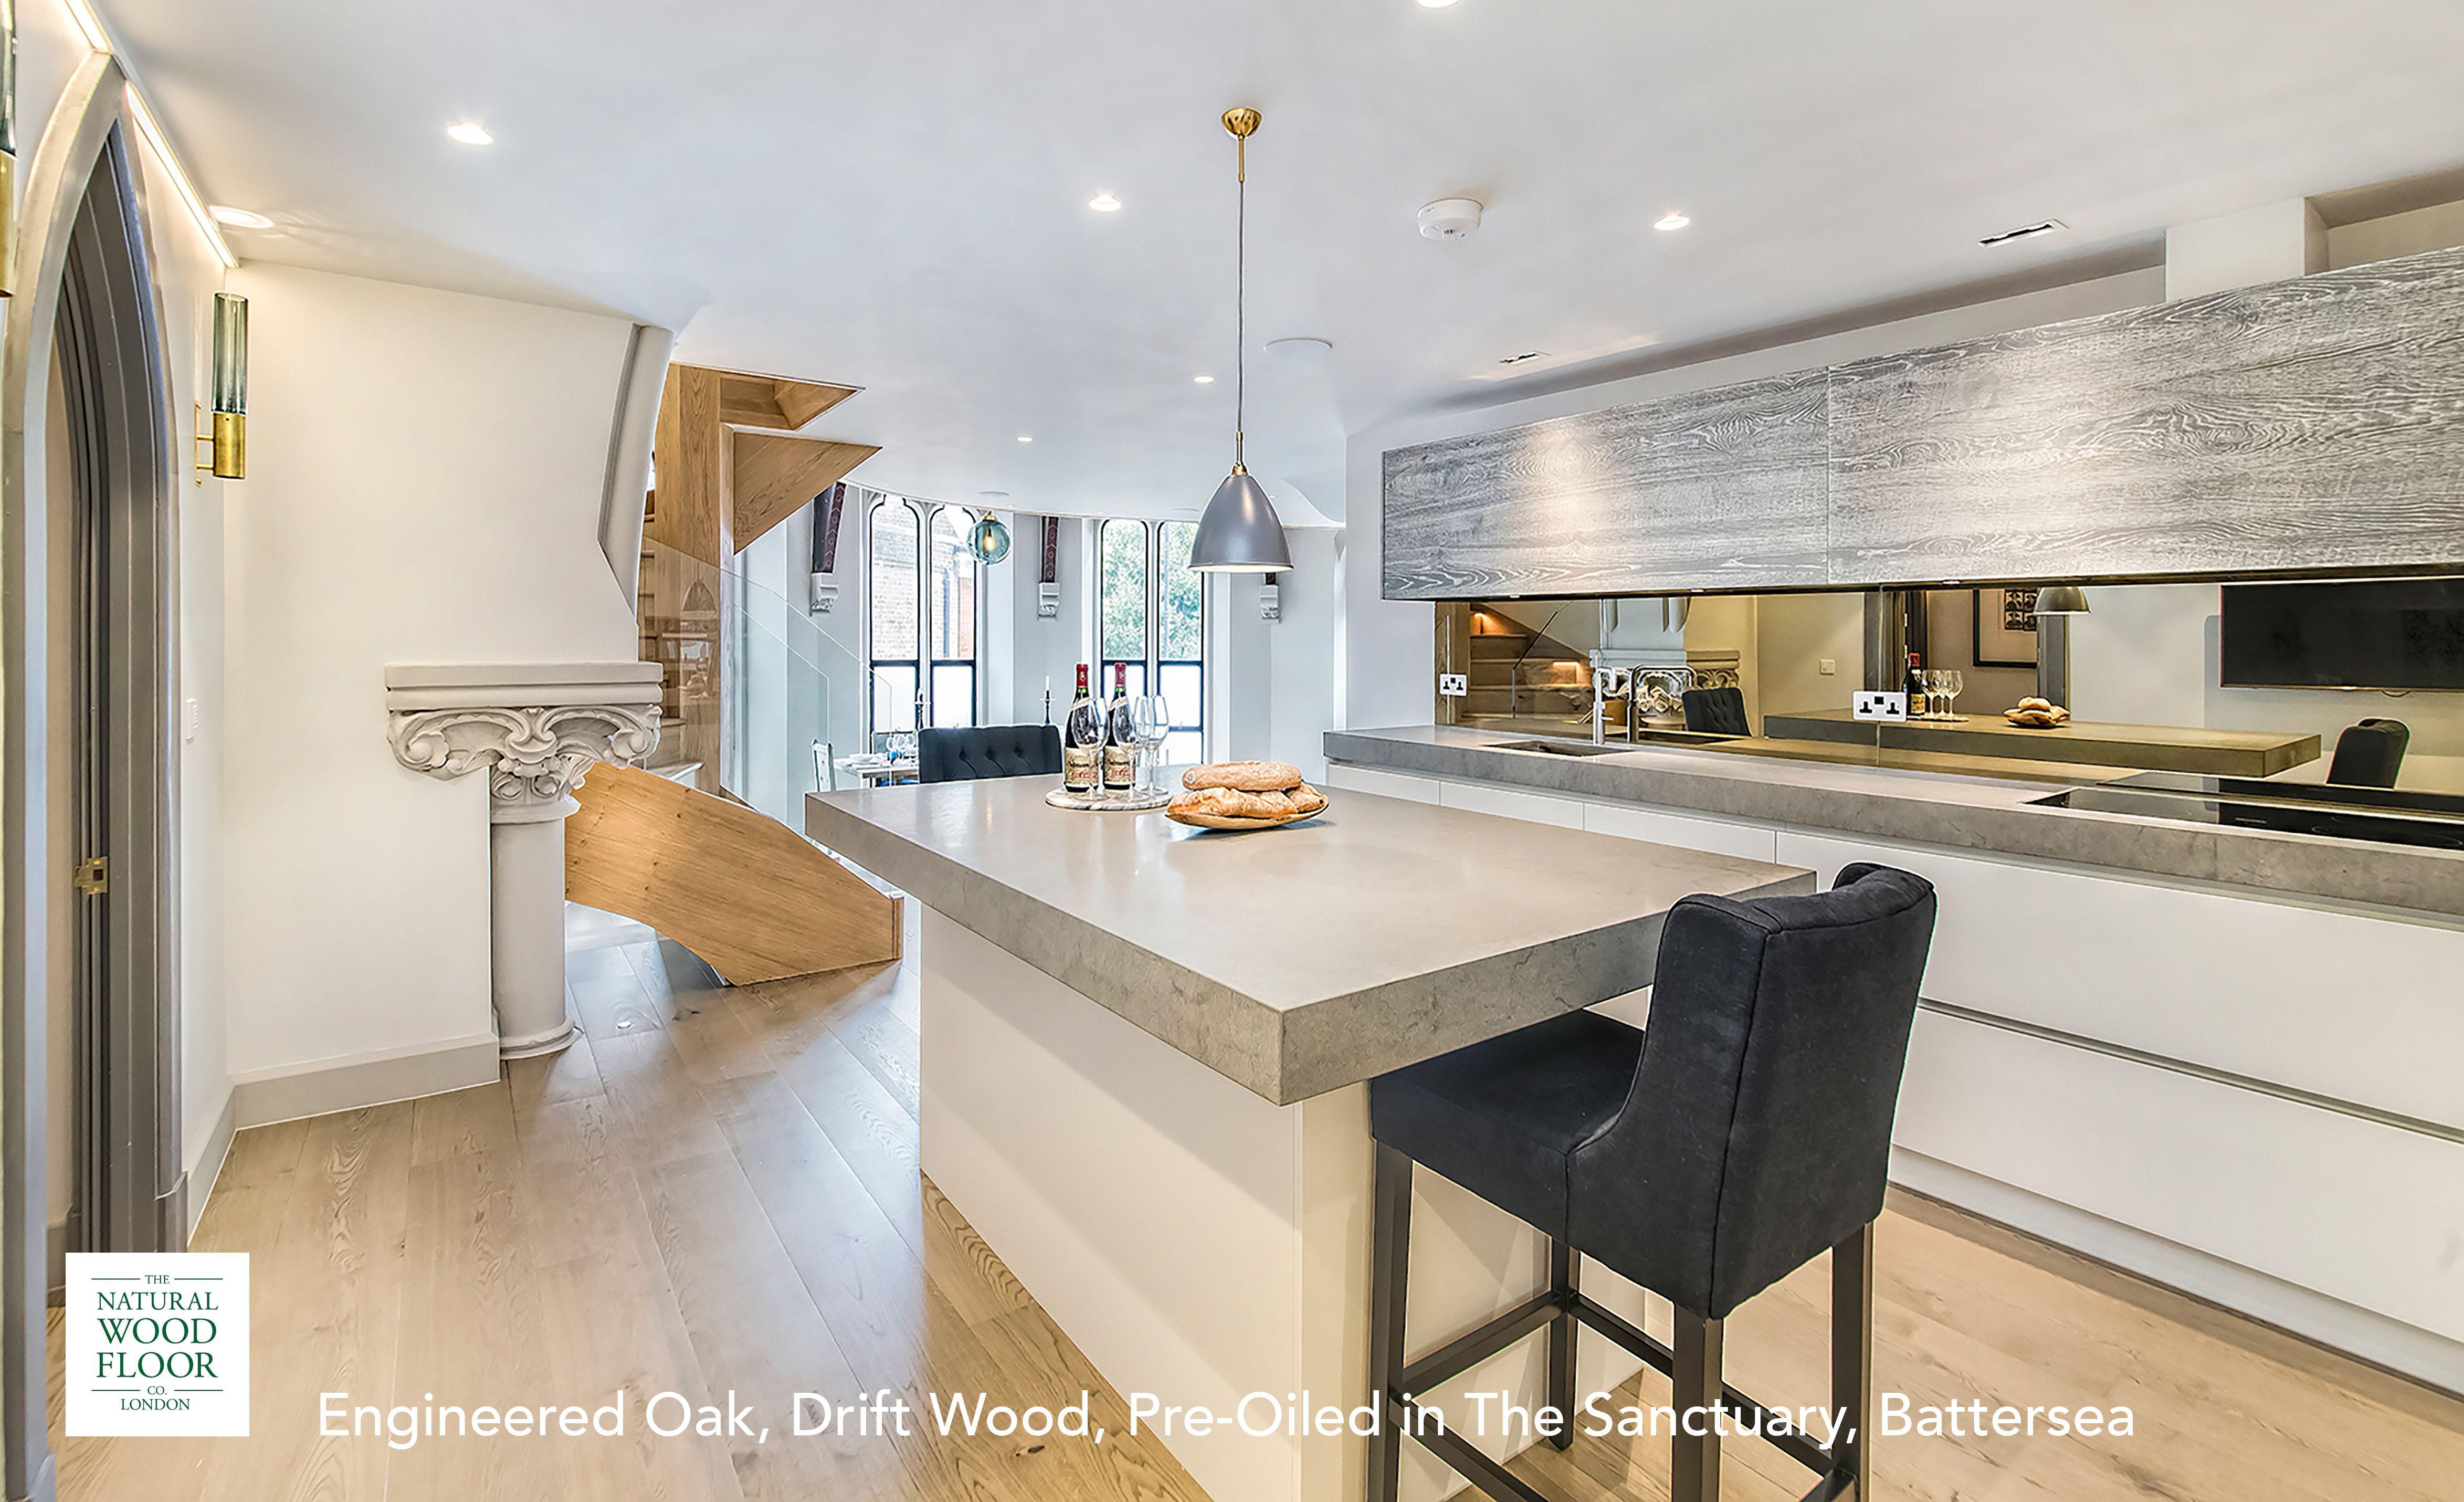 Hardwood Flooring Business Plan: The Natural Wood Floor Company's Pre-Oiled Drift Wood Oak